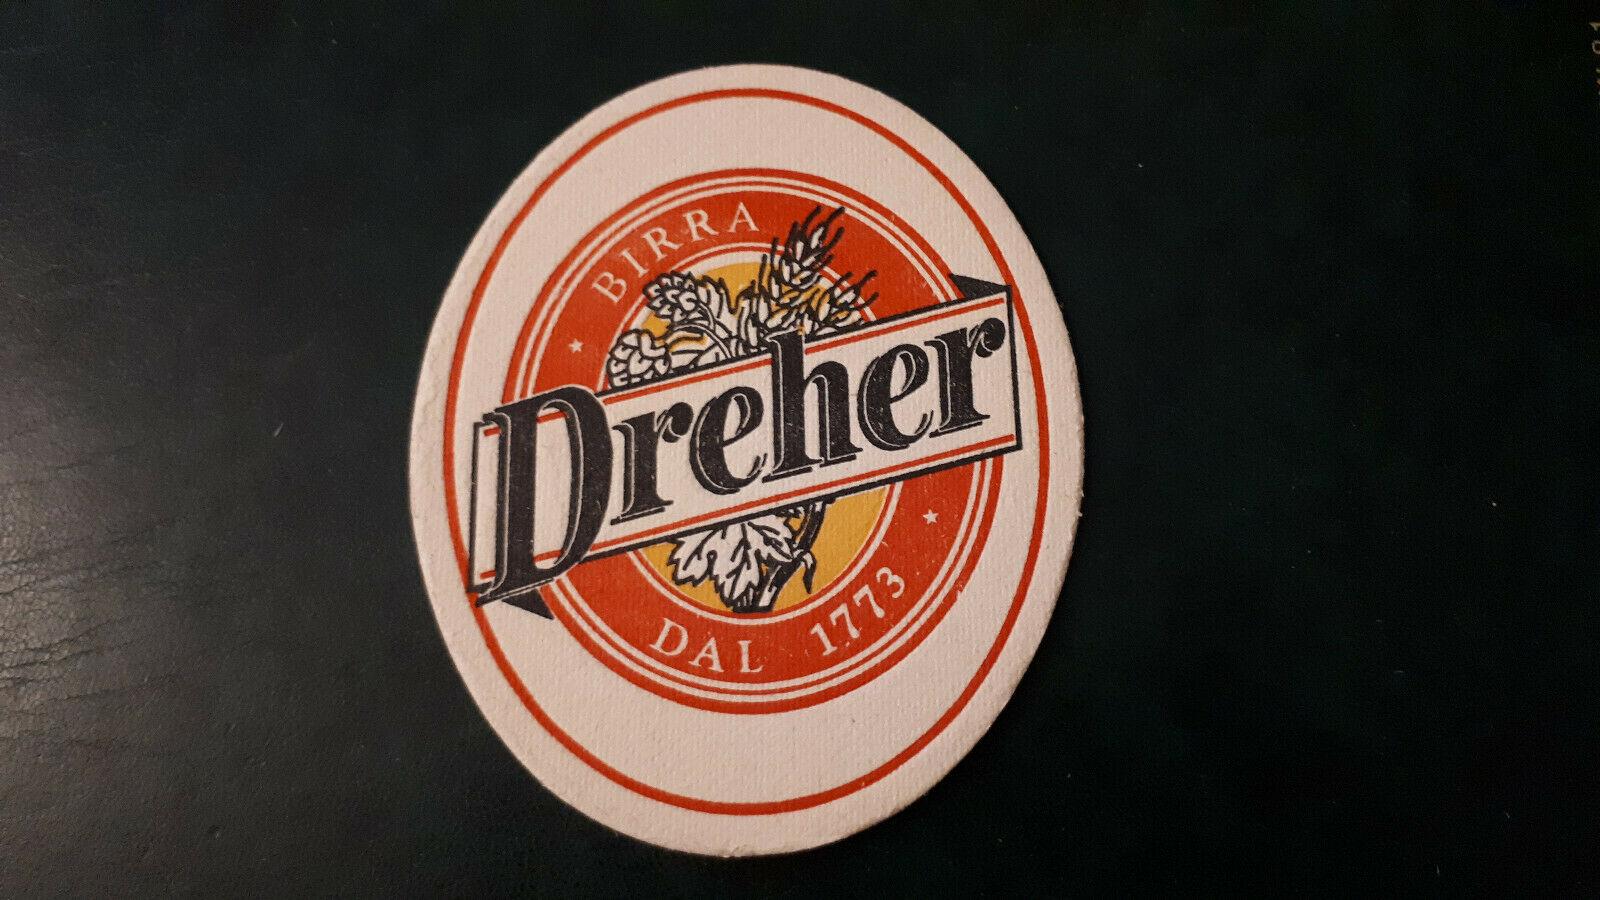 Dreher Bier